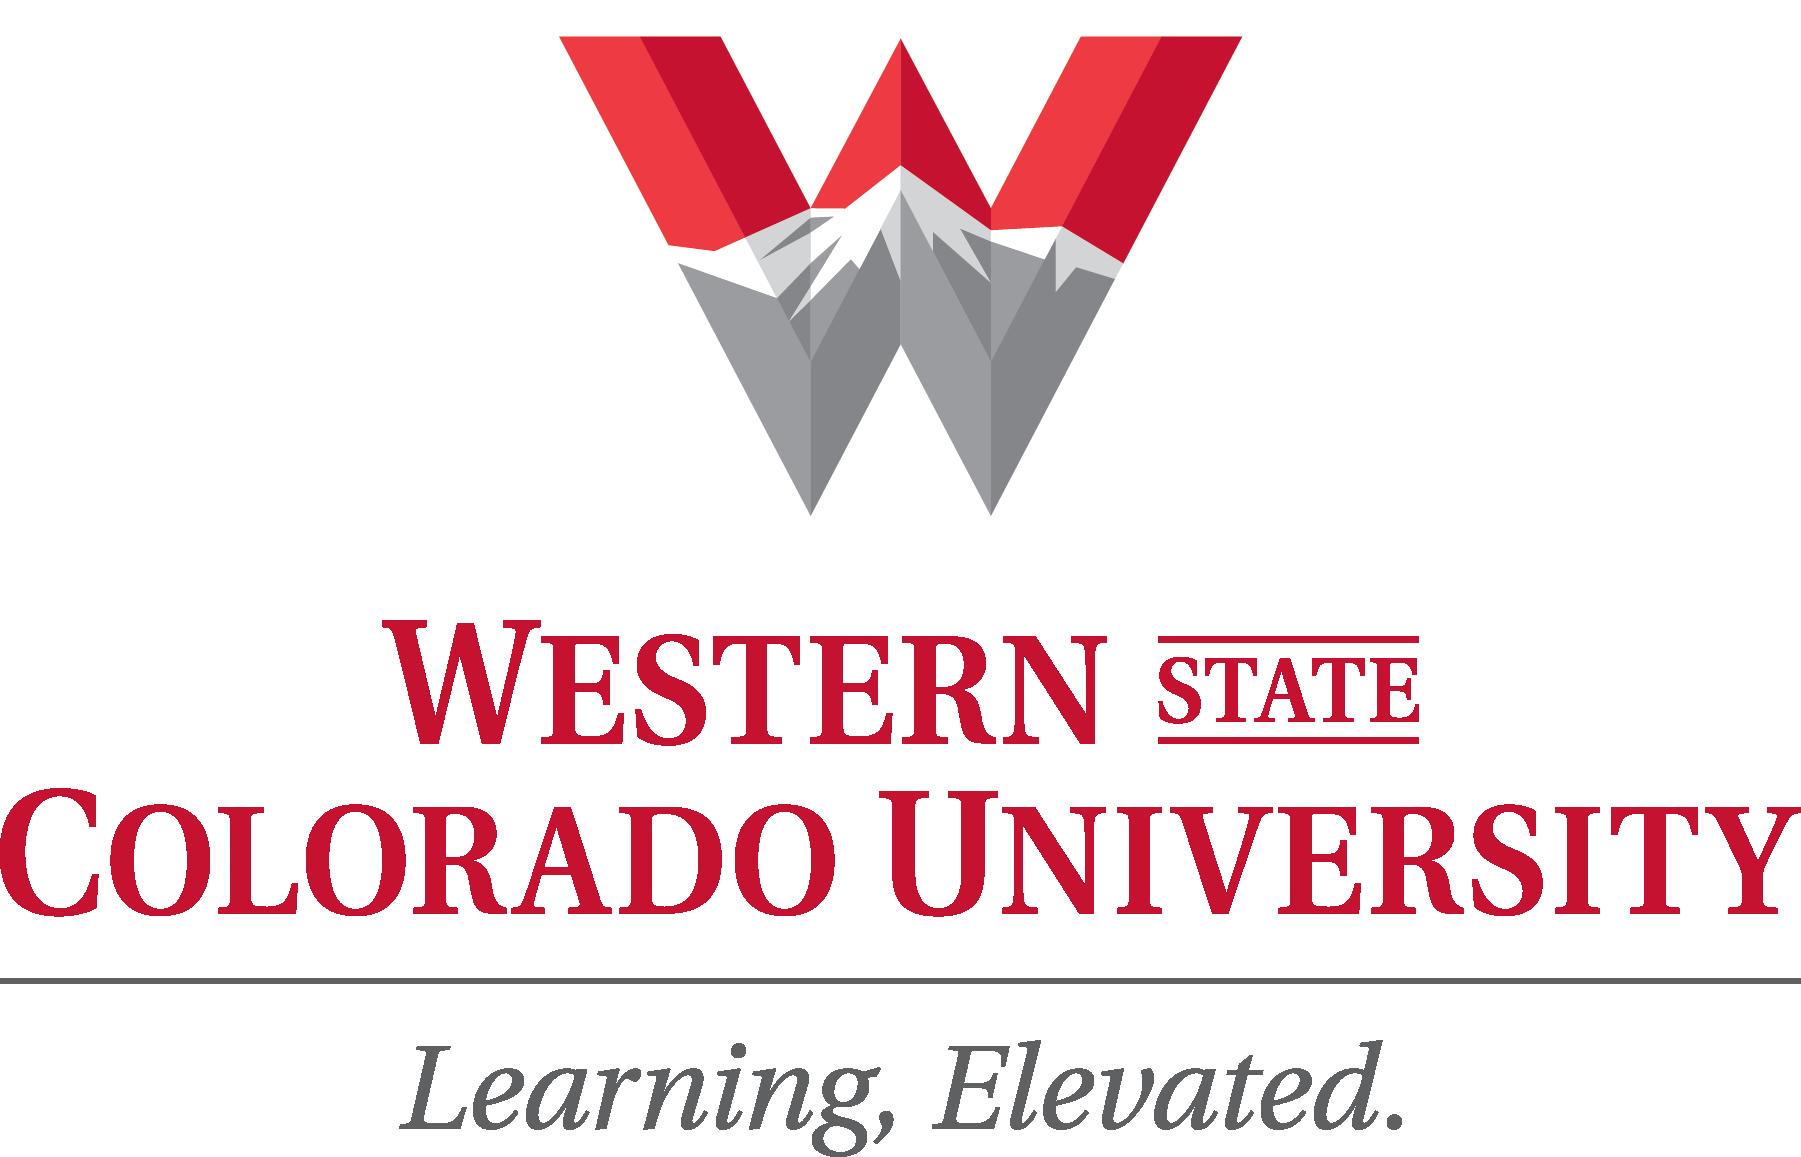 Western State Colorado University   Learning, Elevated.   Colorado,  Gunnison, University